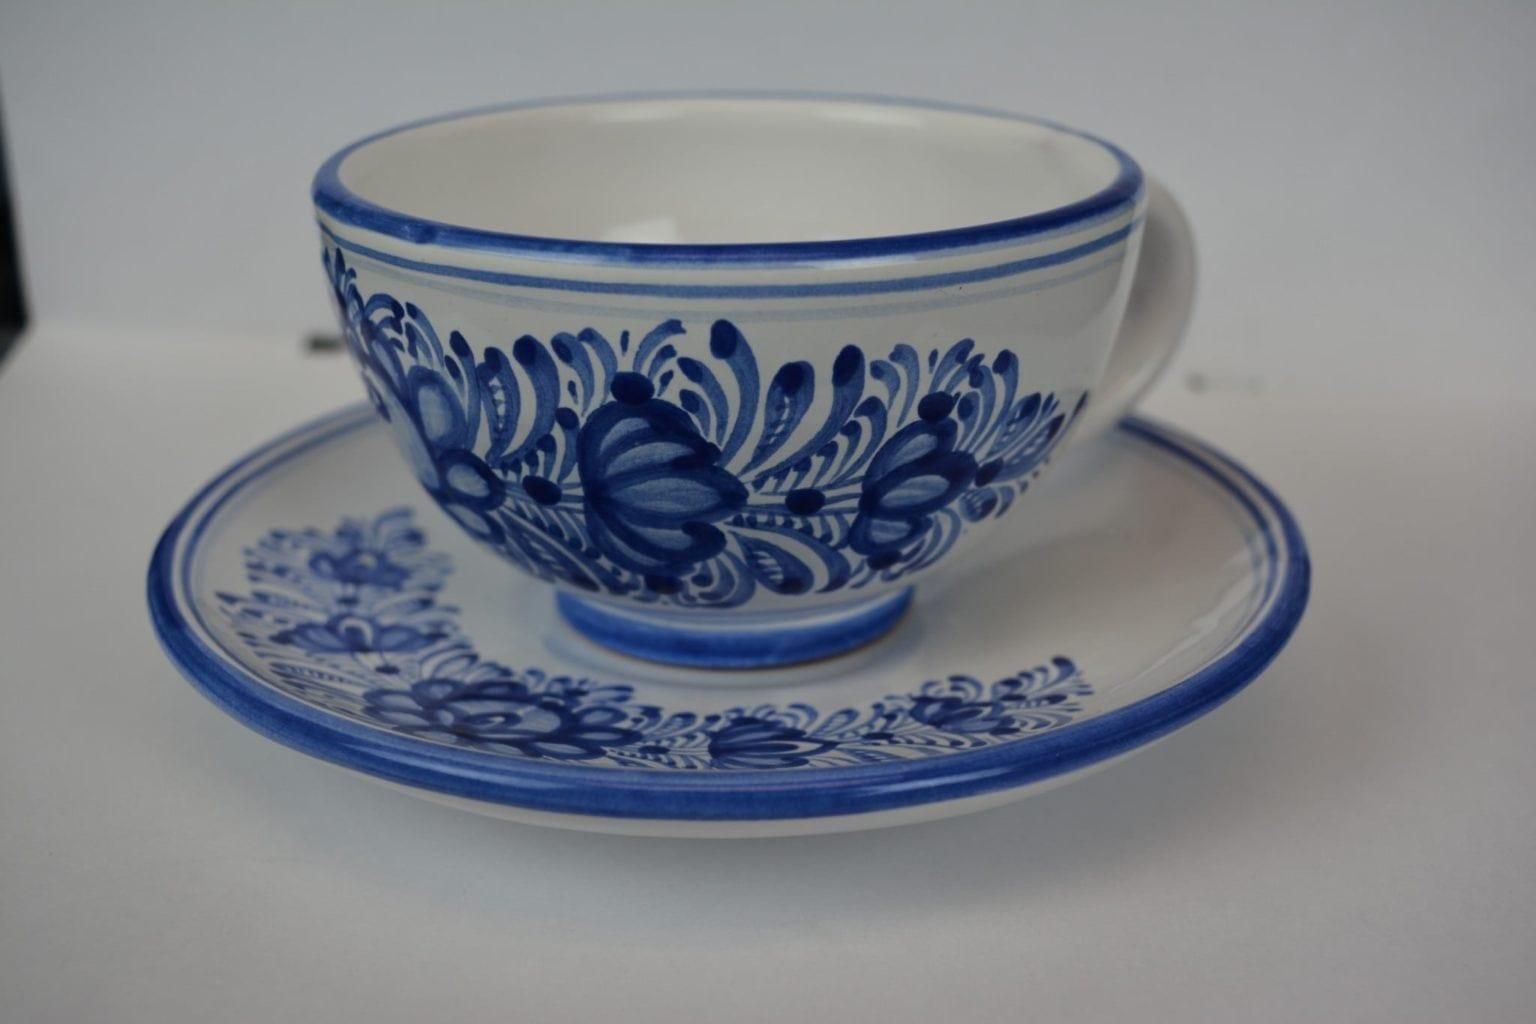 Modra Cup and Saucer